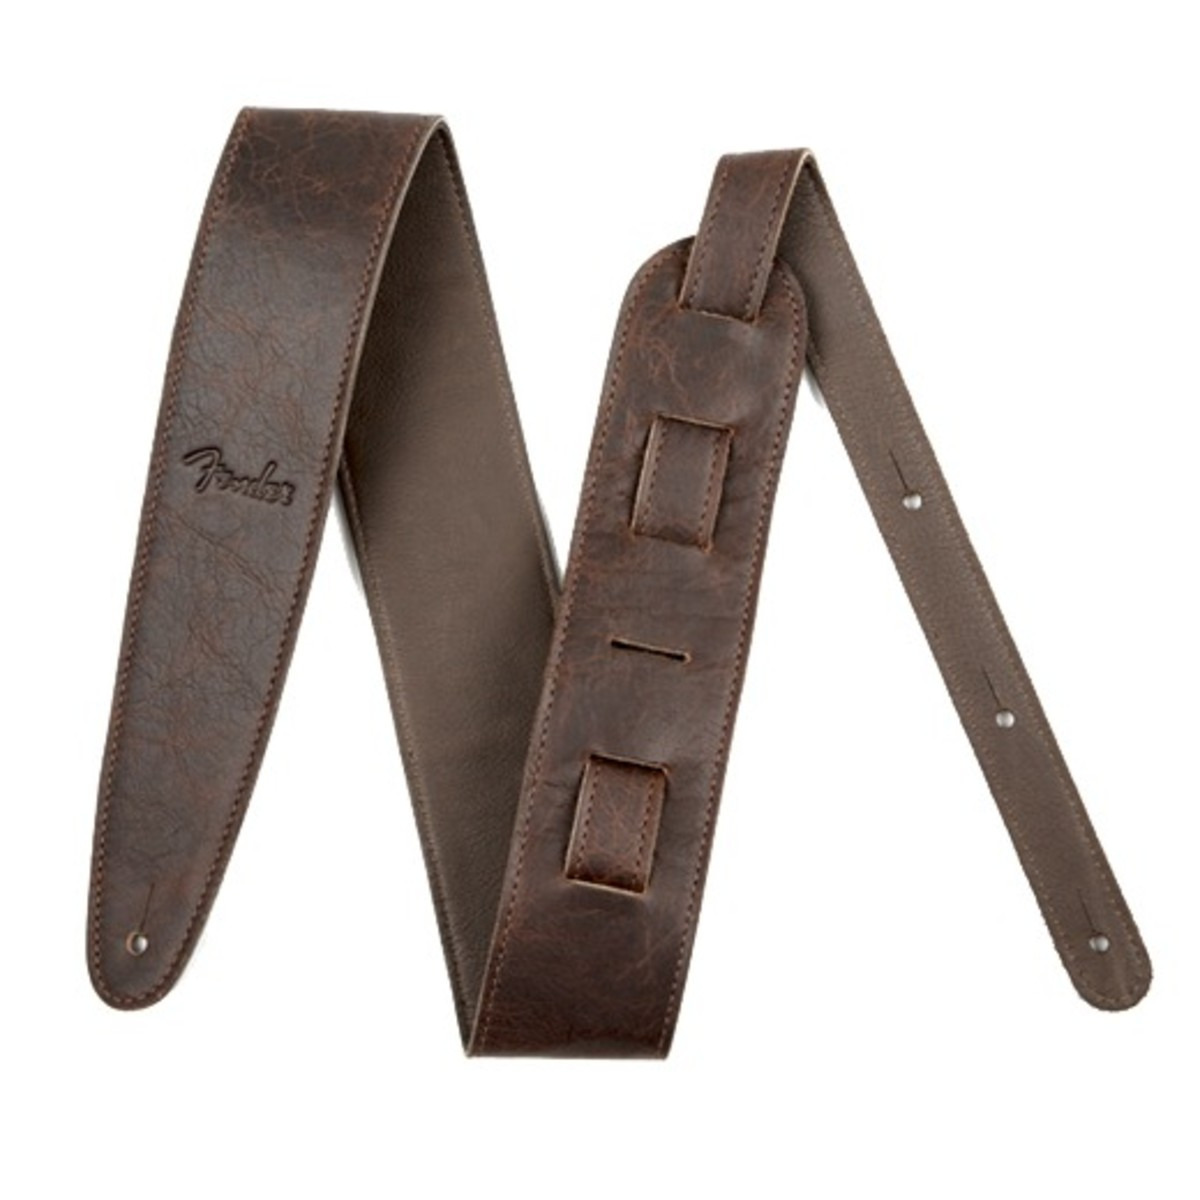 fender artisan crafted leather guitar strap 2 5 brown at. Black Bedroom Furniture Sets. Home Design Ideas